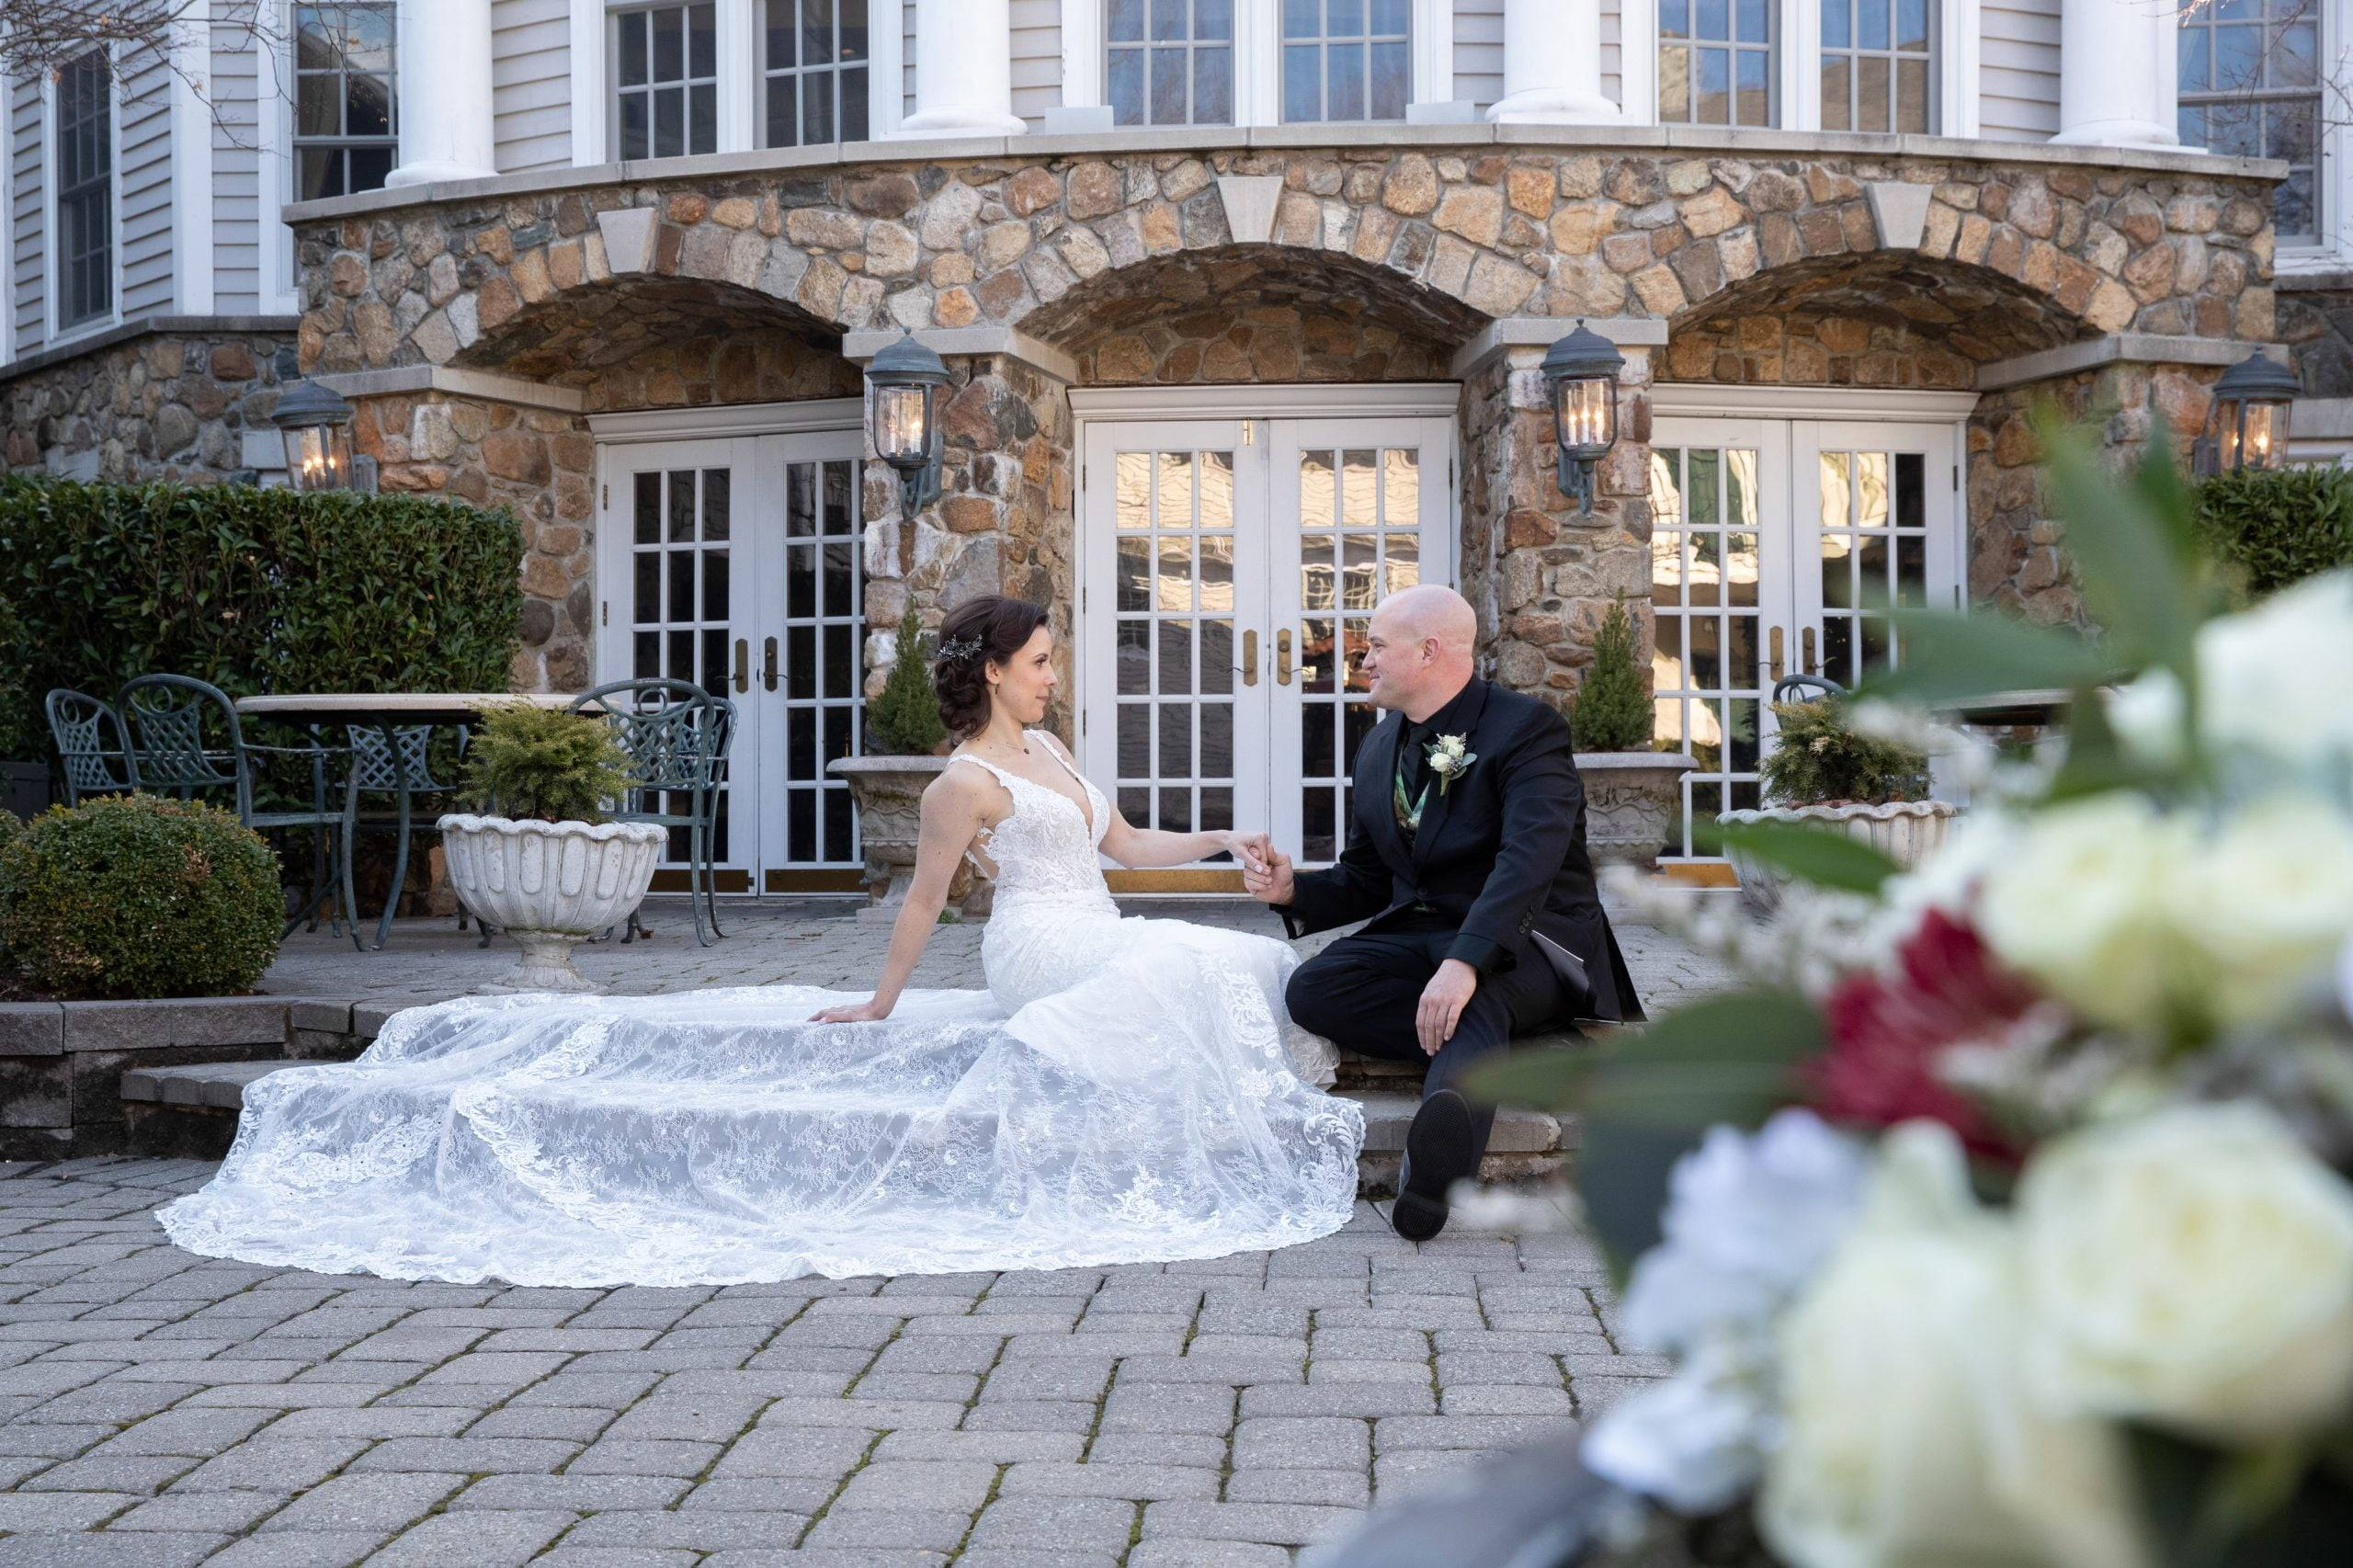 Olde Mill Inn bride and groom sitting on patio